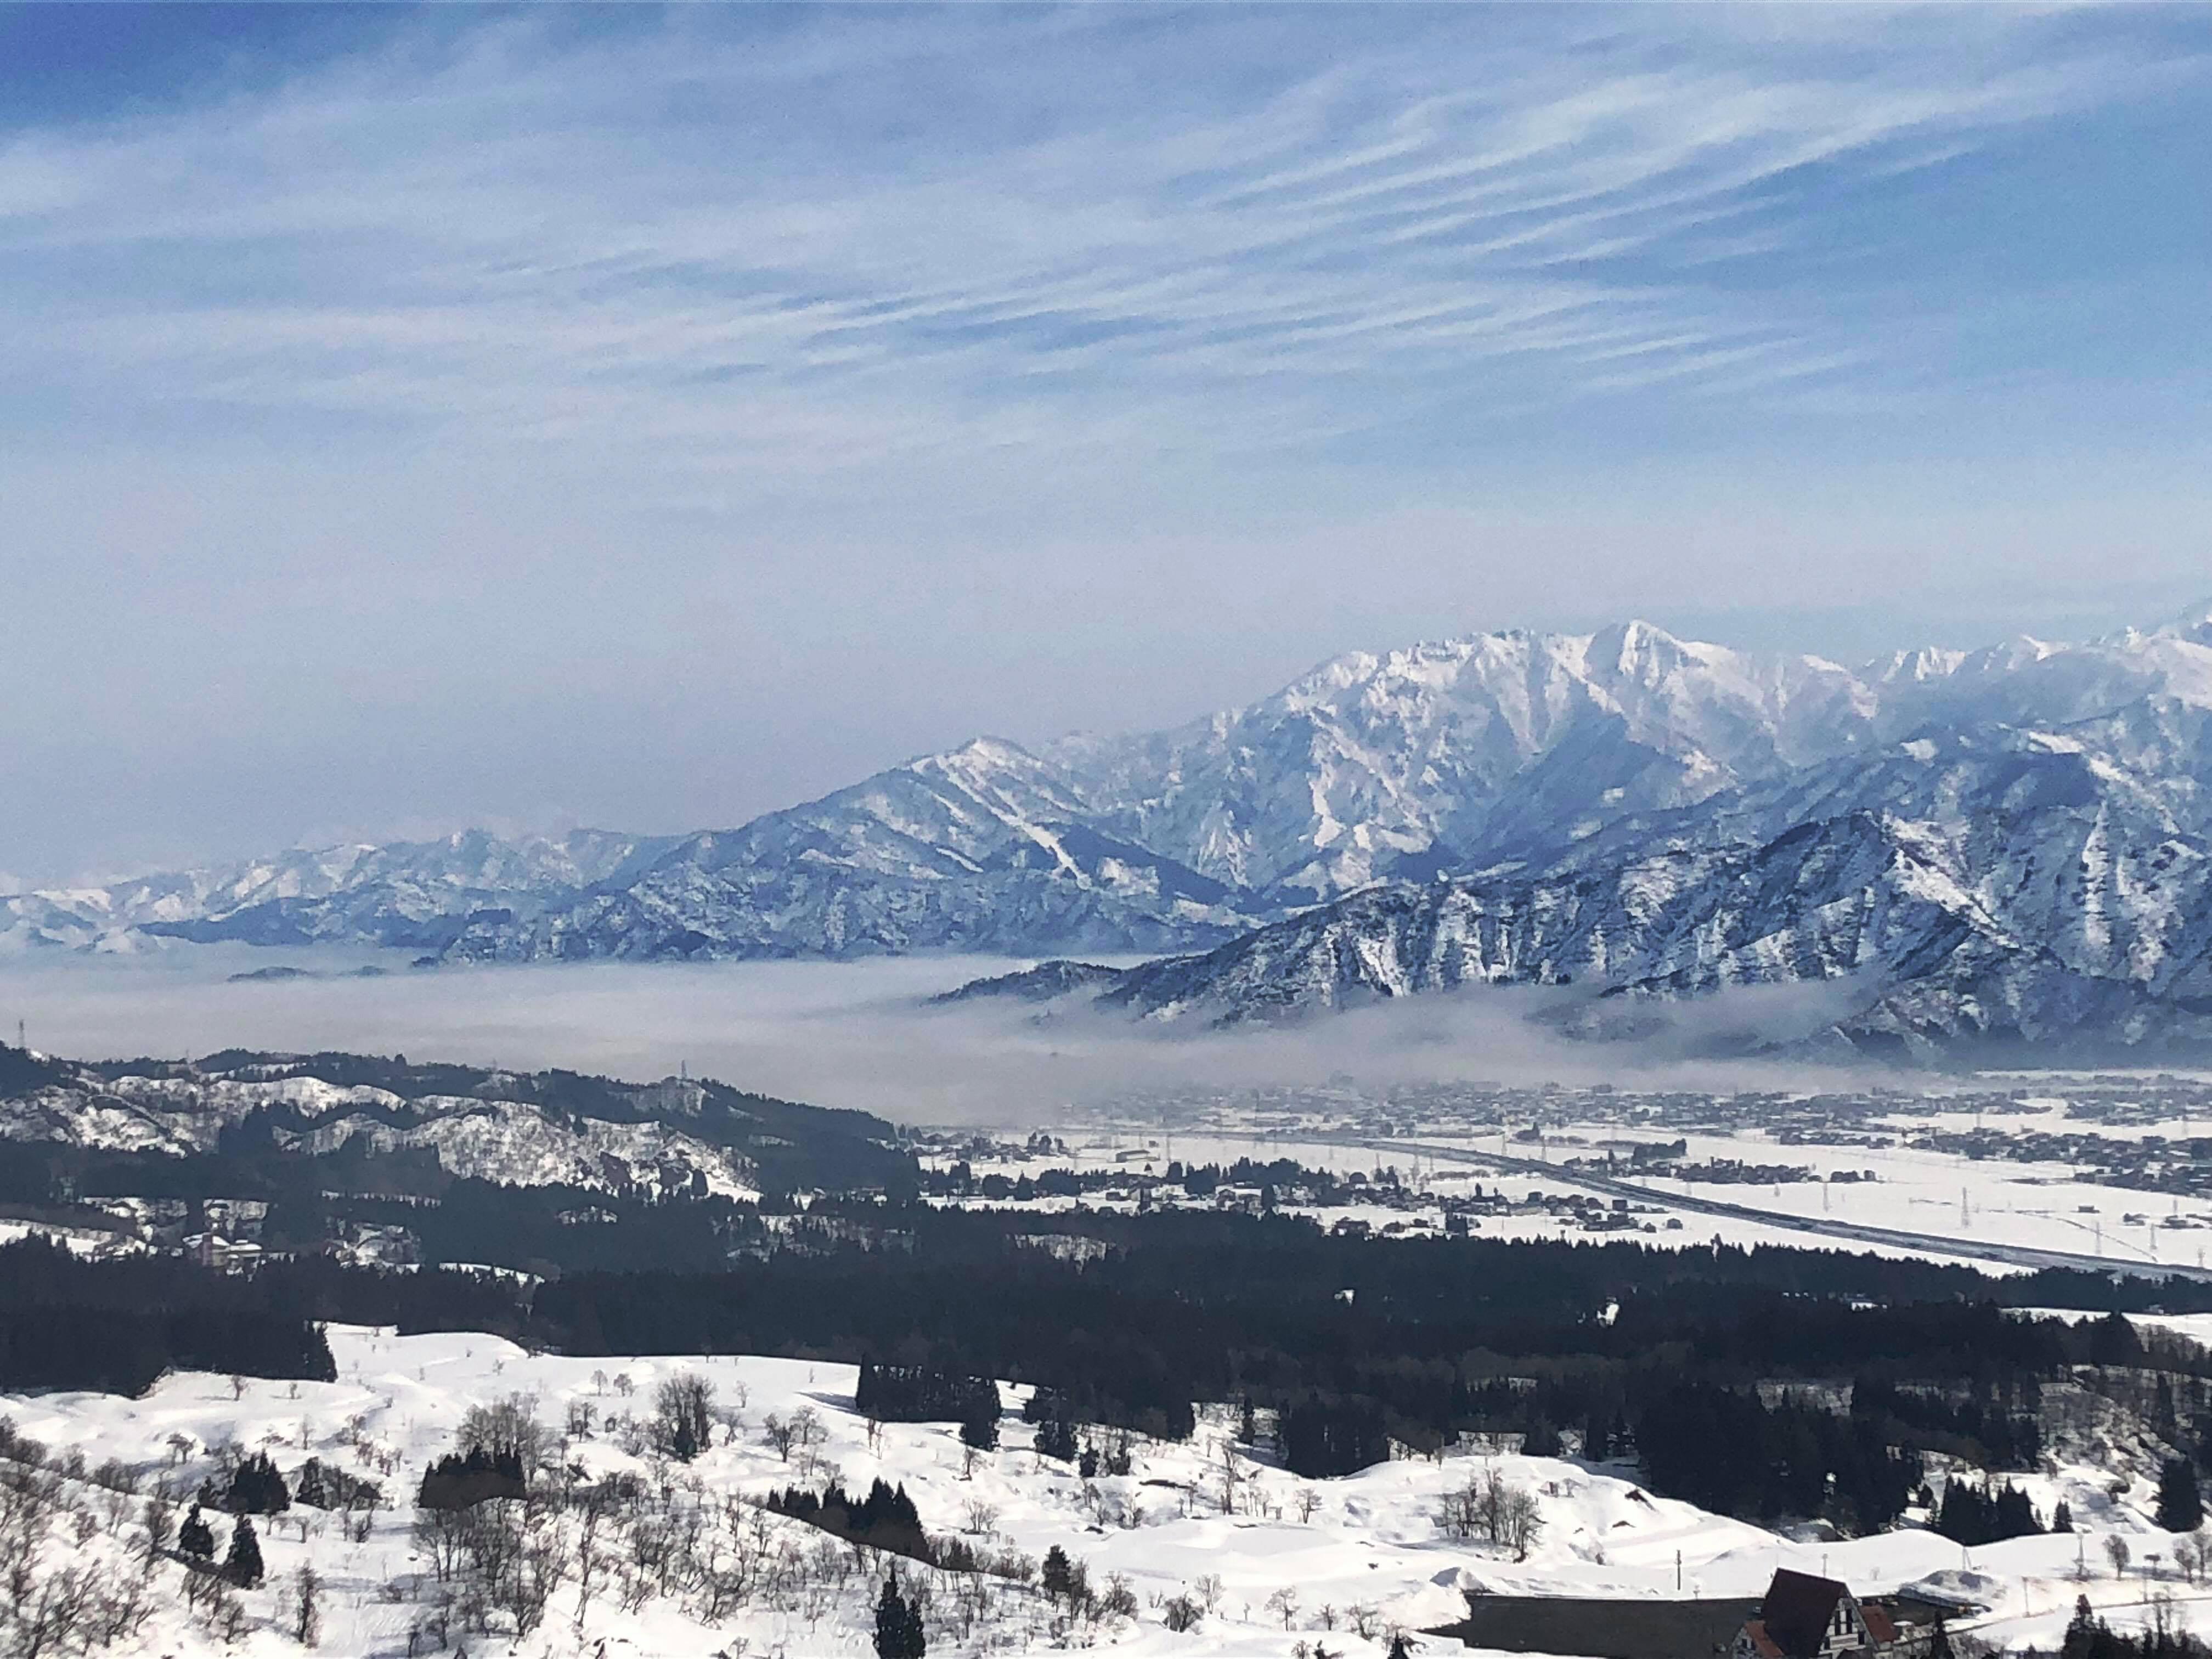 2018.1.16 tue. スキーしながら雲海鑑賞ぉ~ BY HUNTER-KYUN